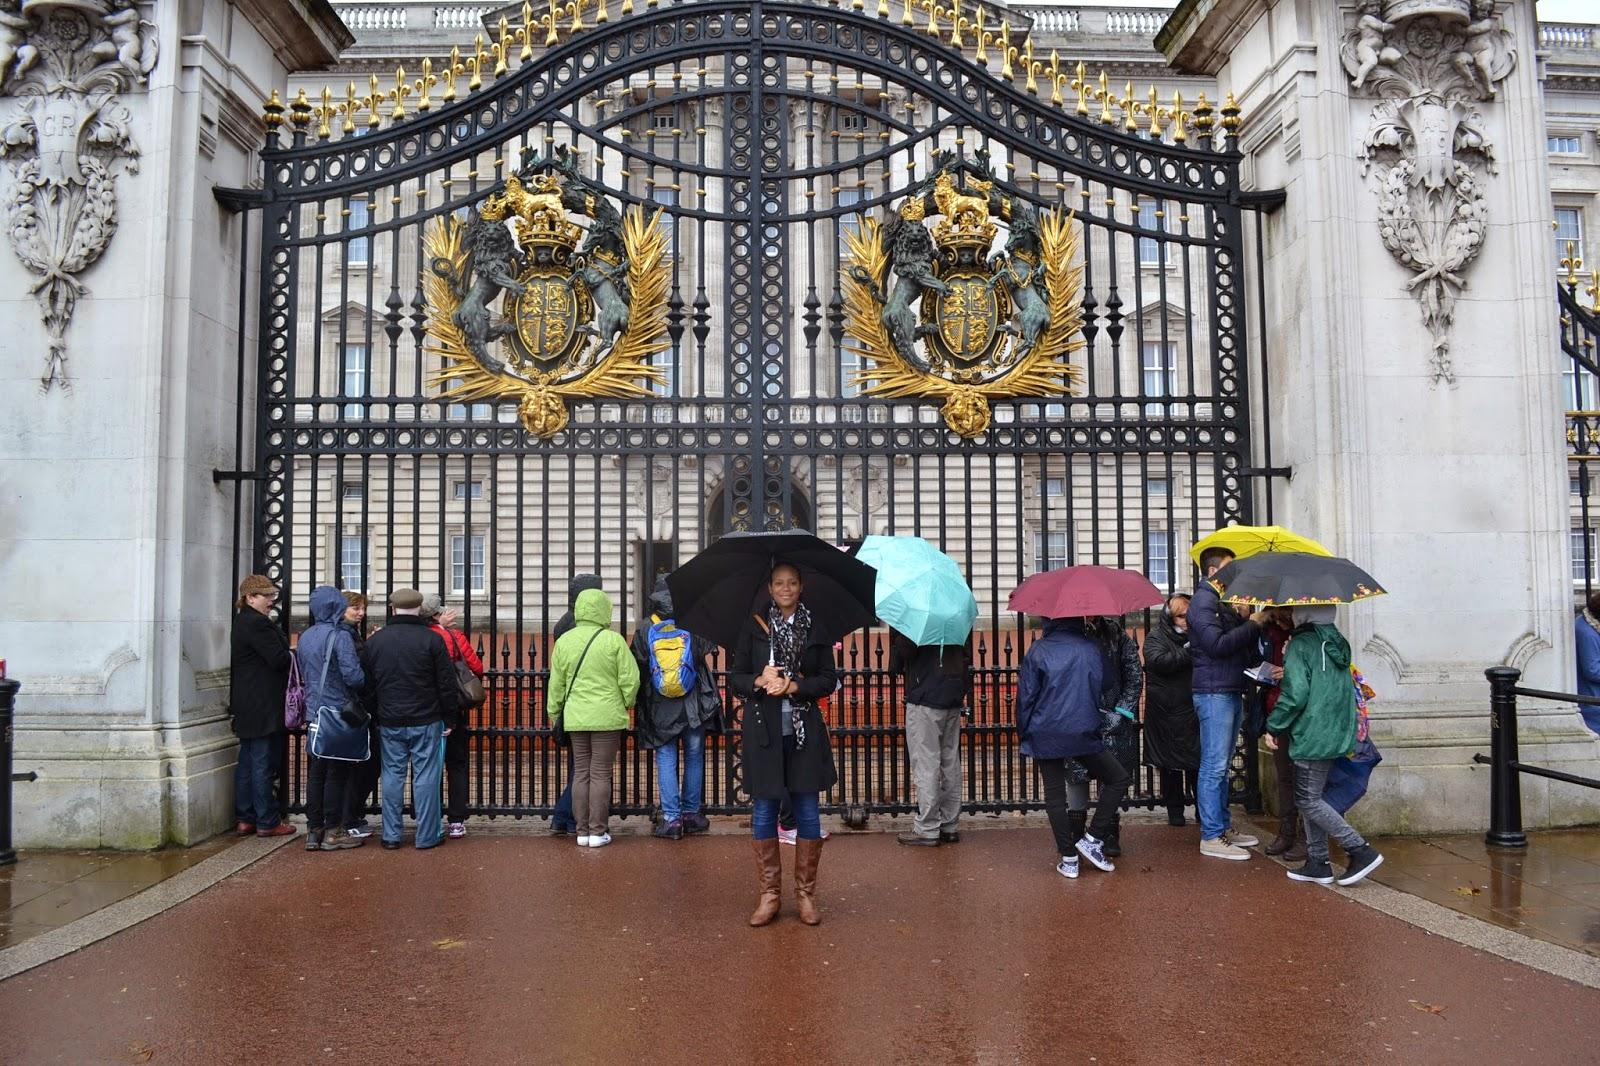 Buckingham Palace honeymone in London